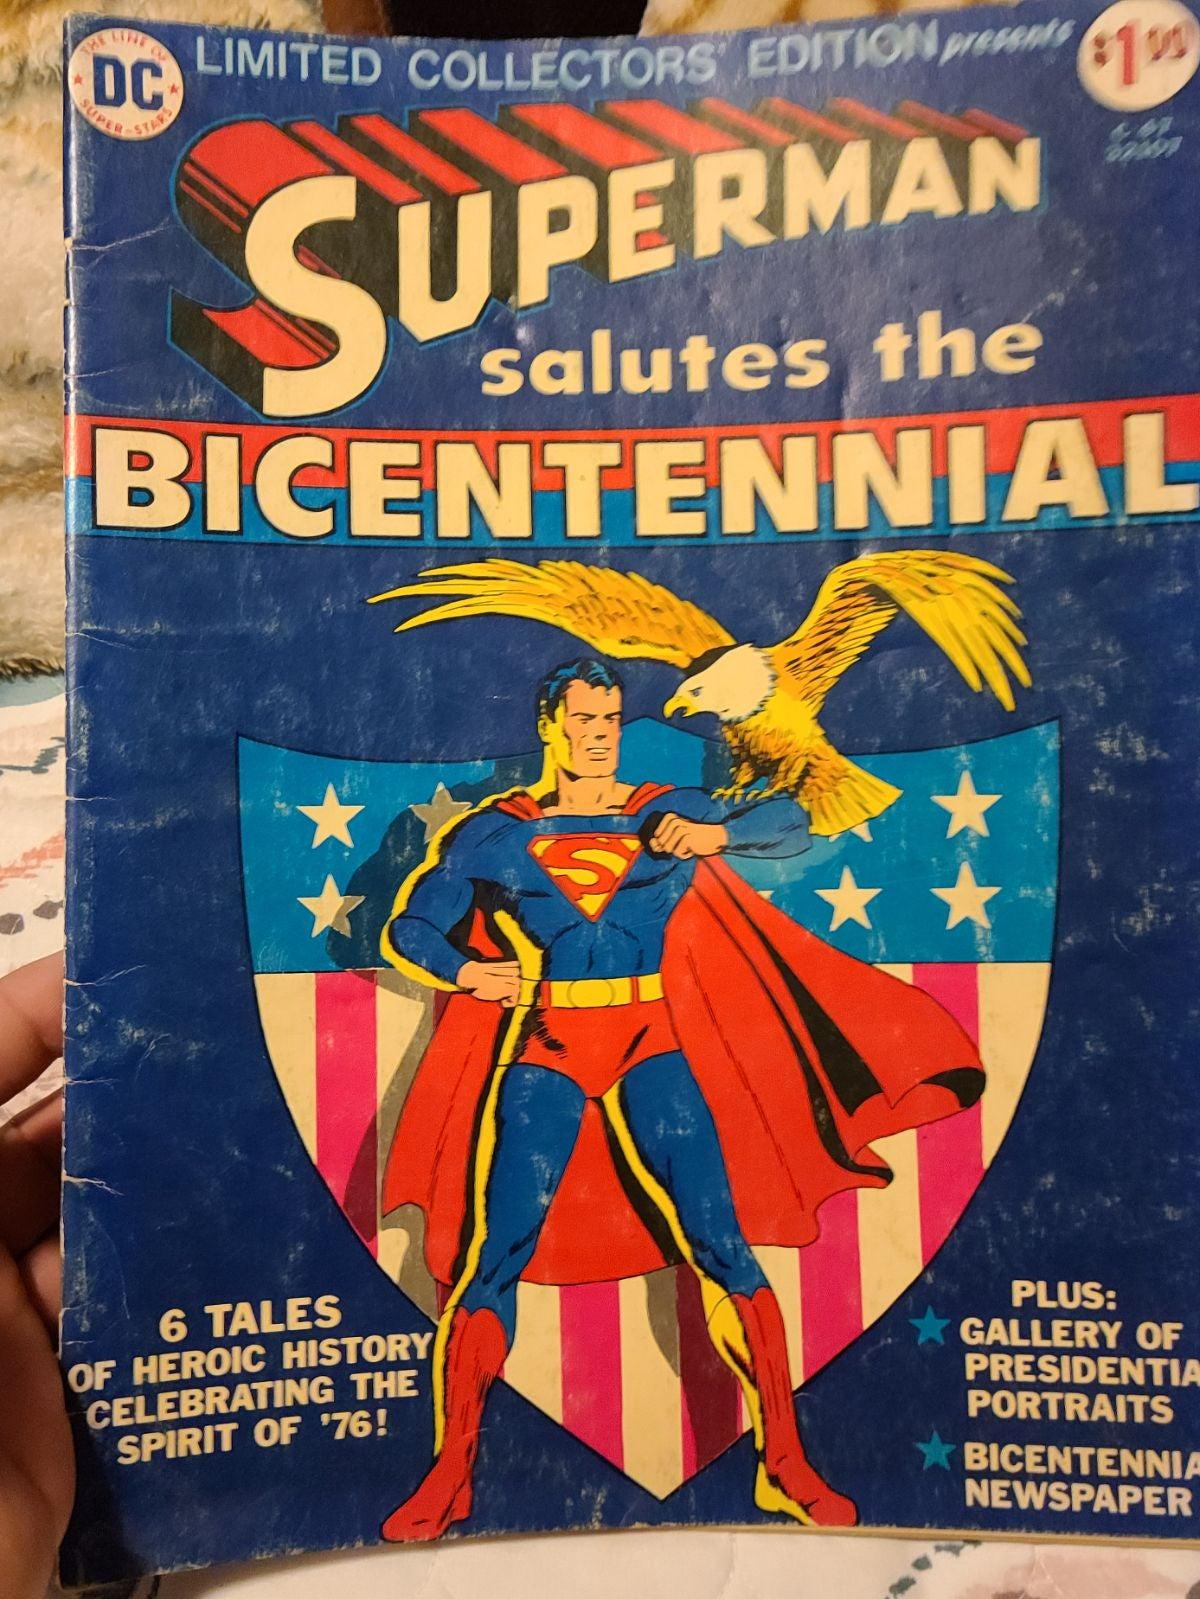 Superman bicentennial treasury edition c